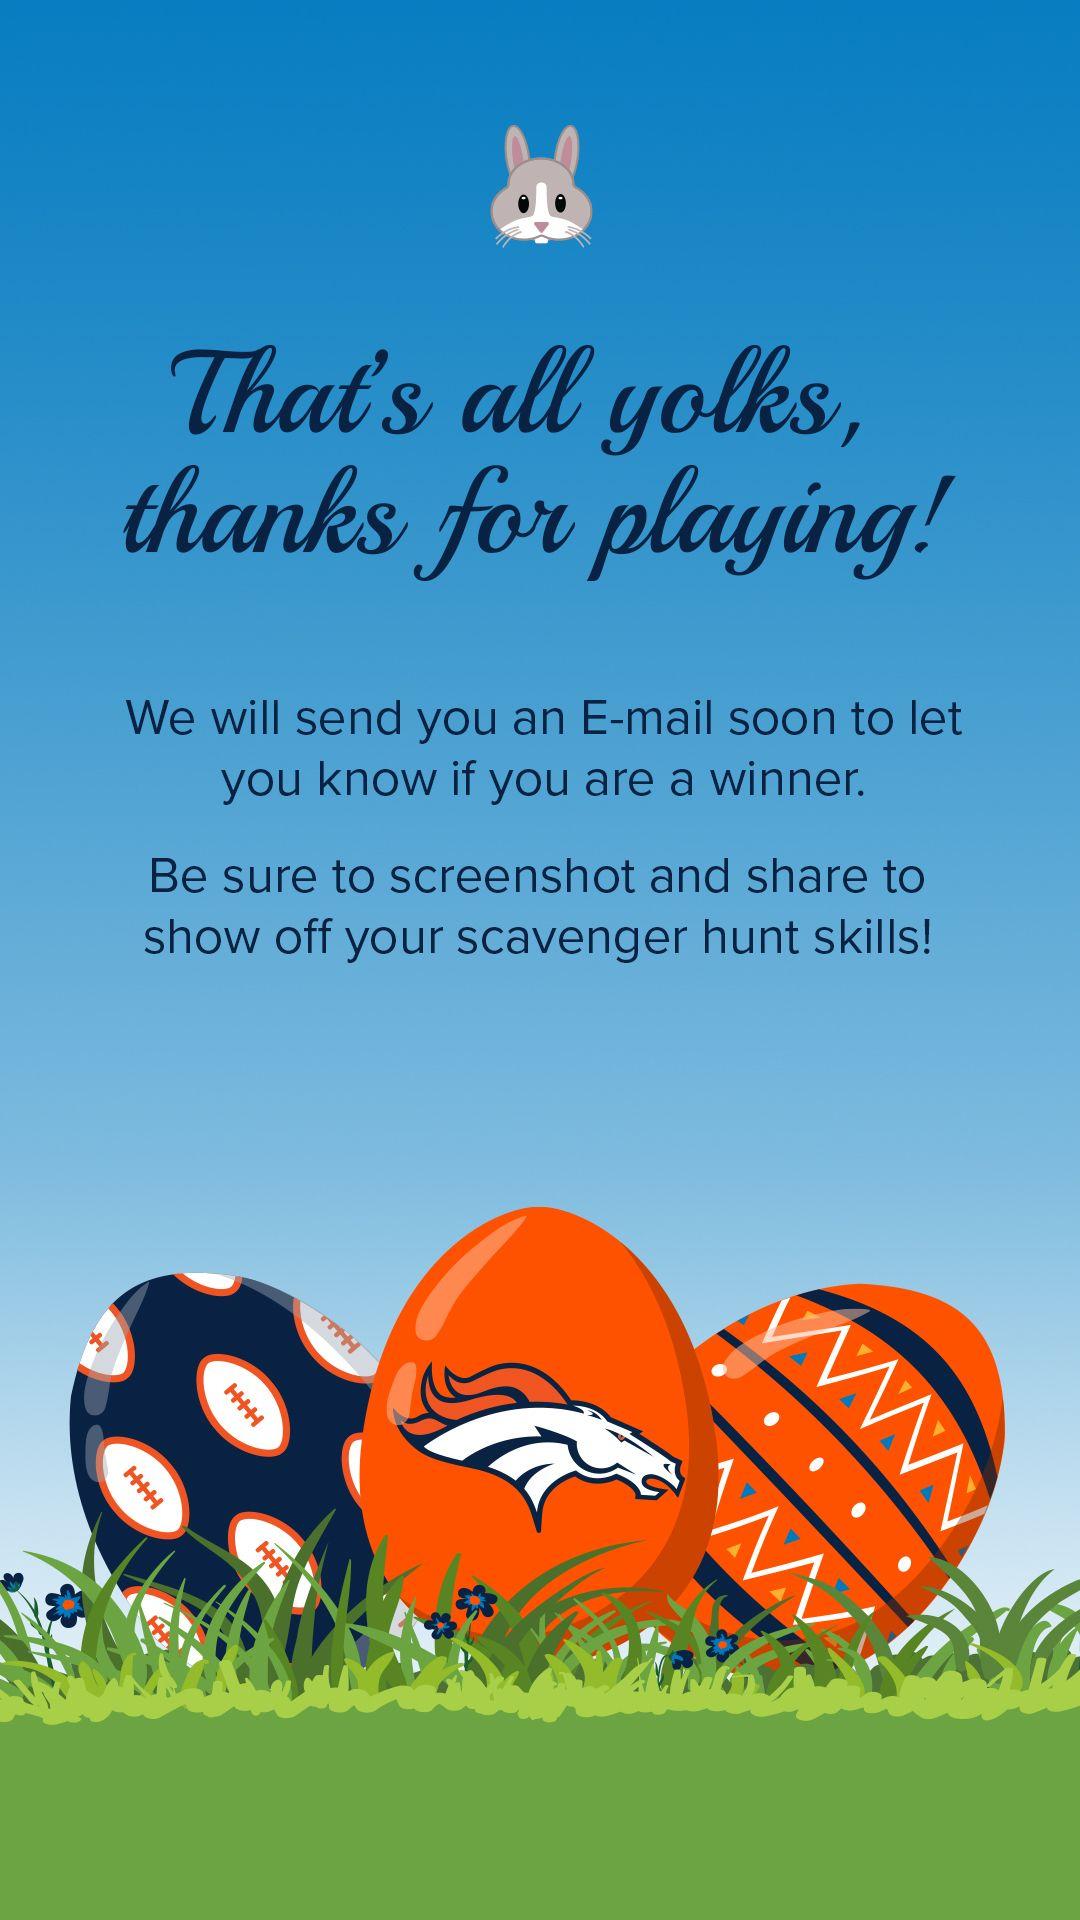 scavenger_hunt_thank_you_vert